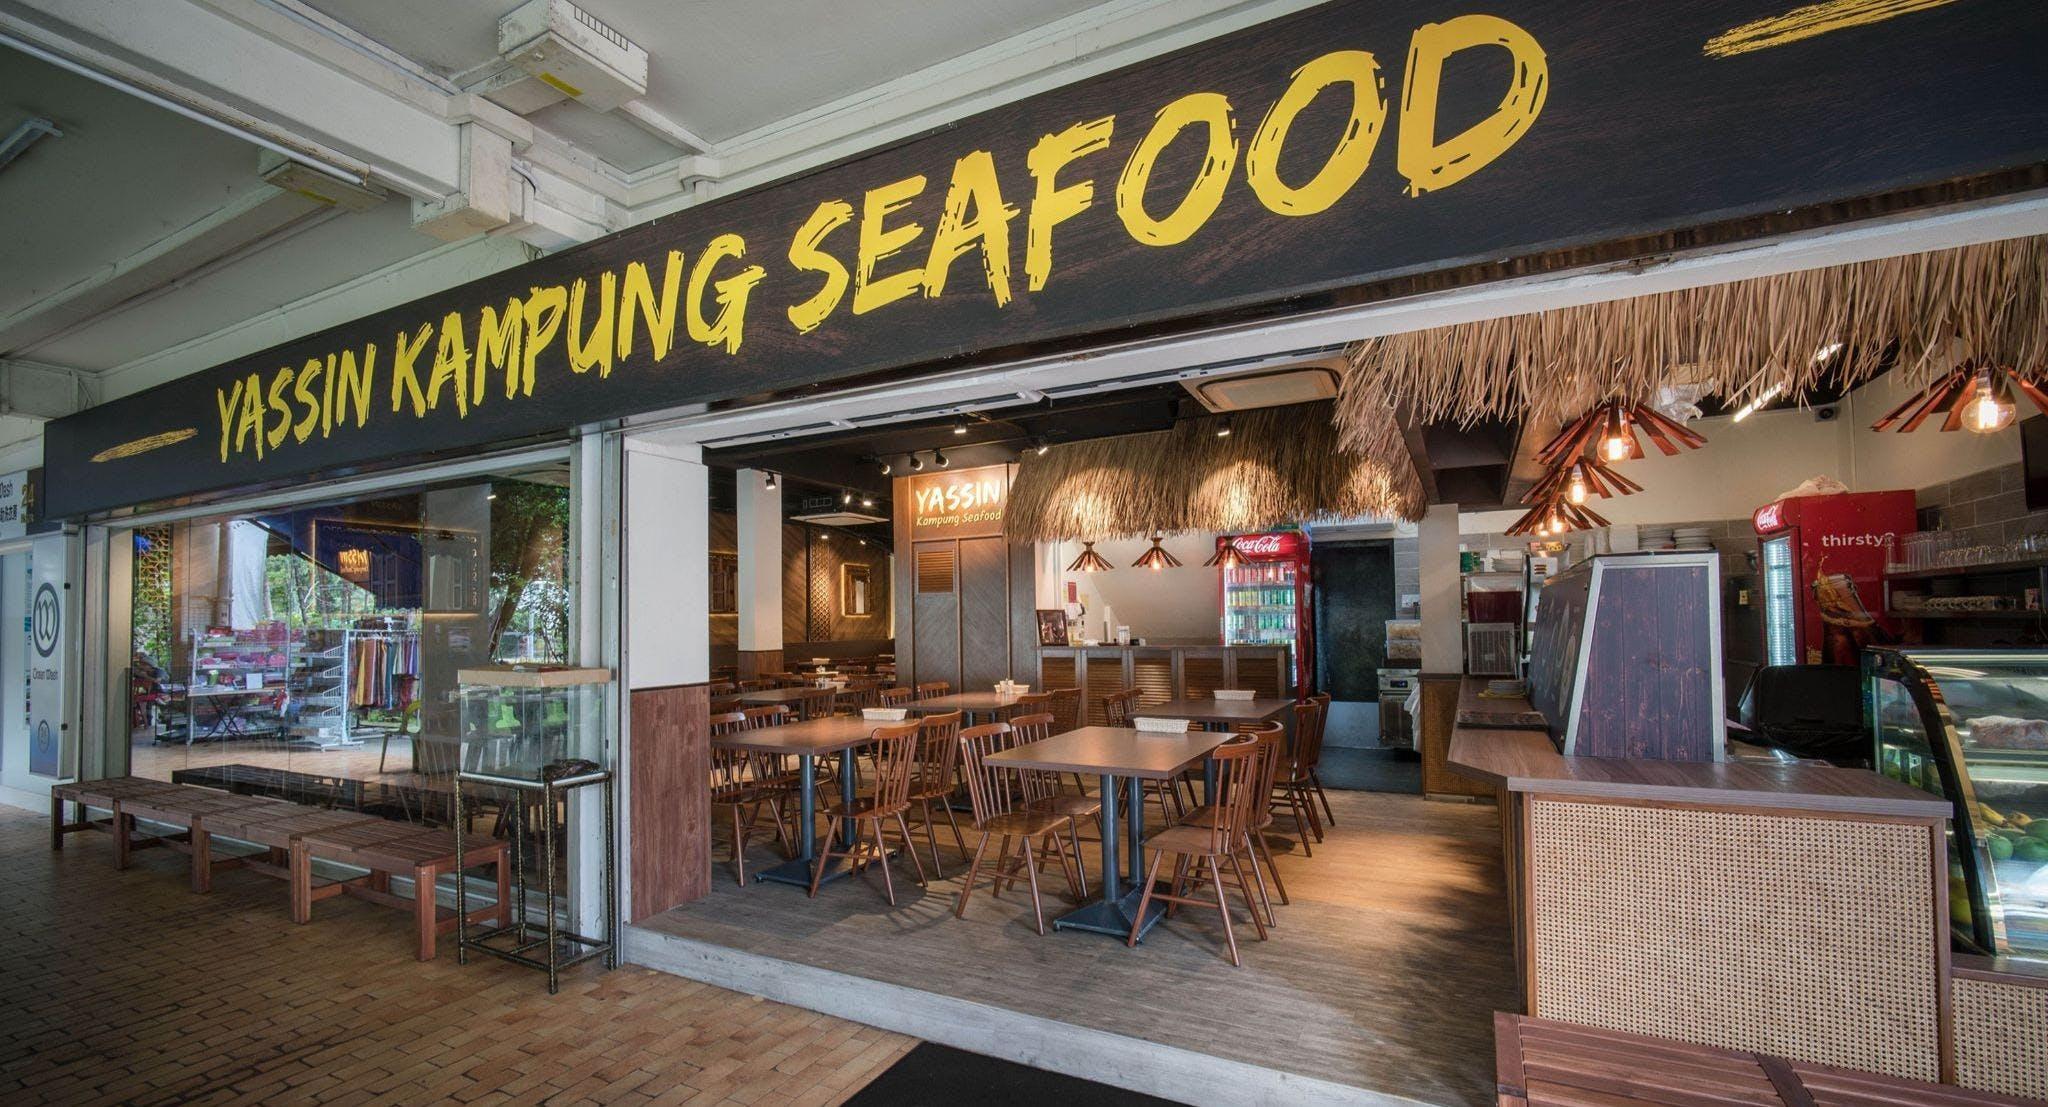 Yassin Kampung Seafood Bedok